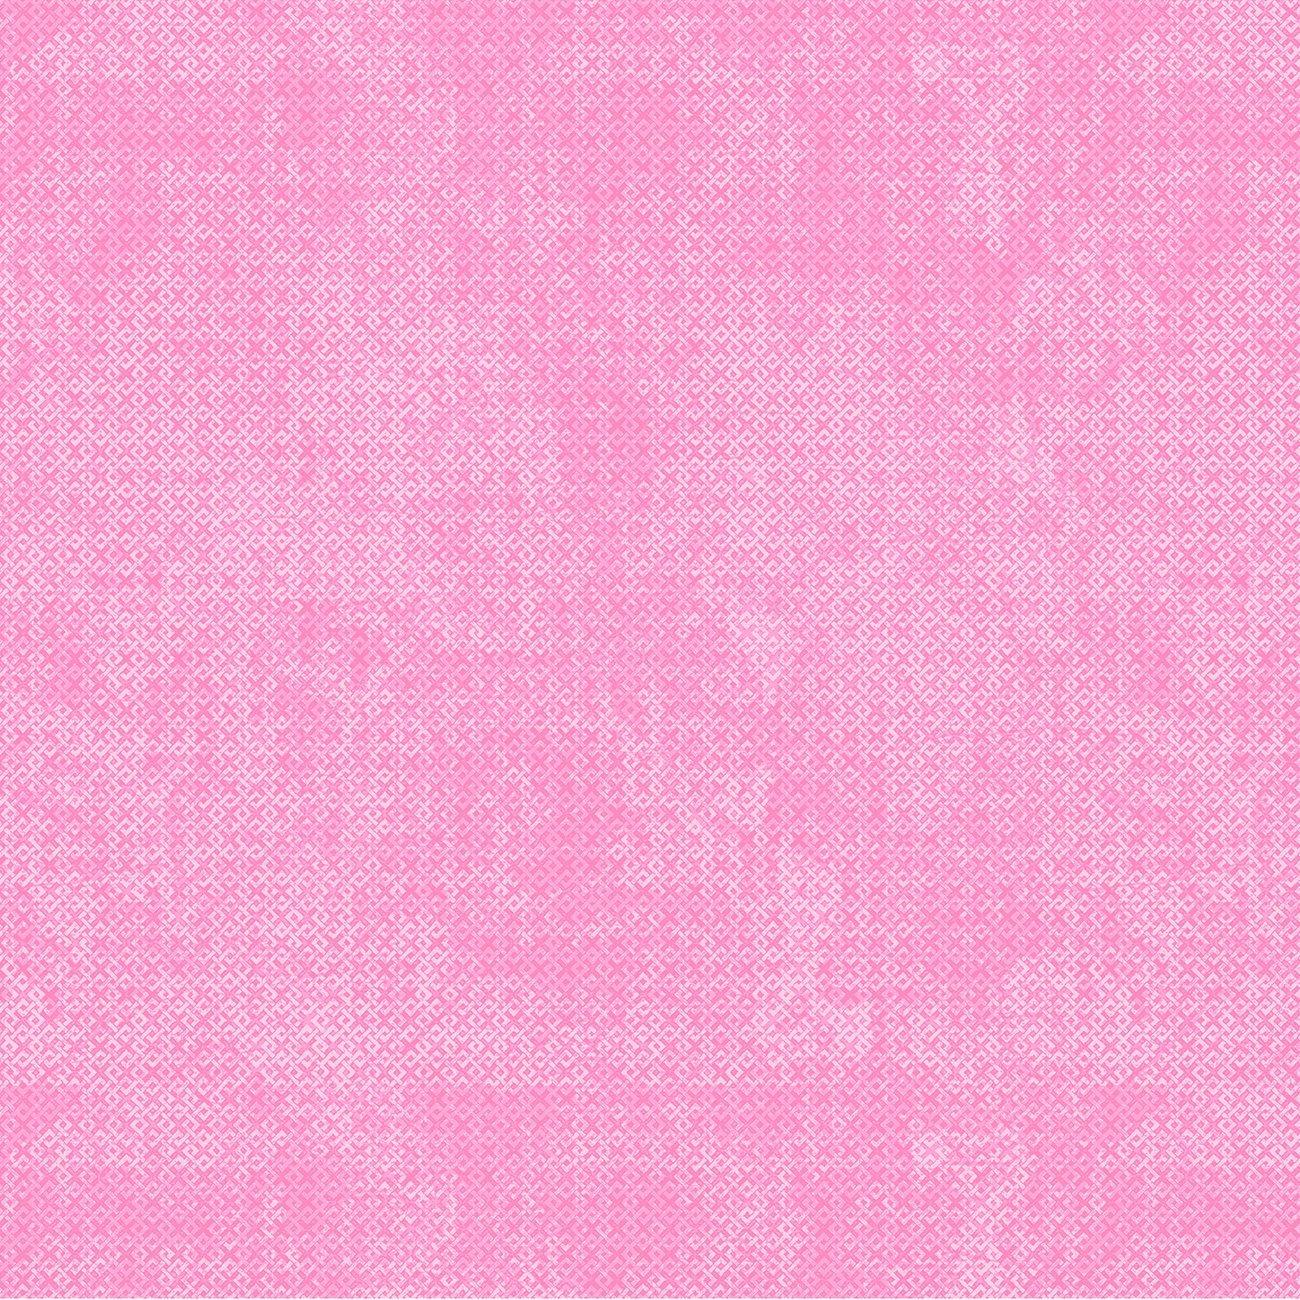 Criss Cross Flannel - Pink